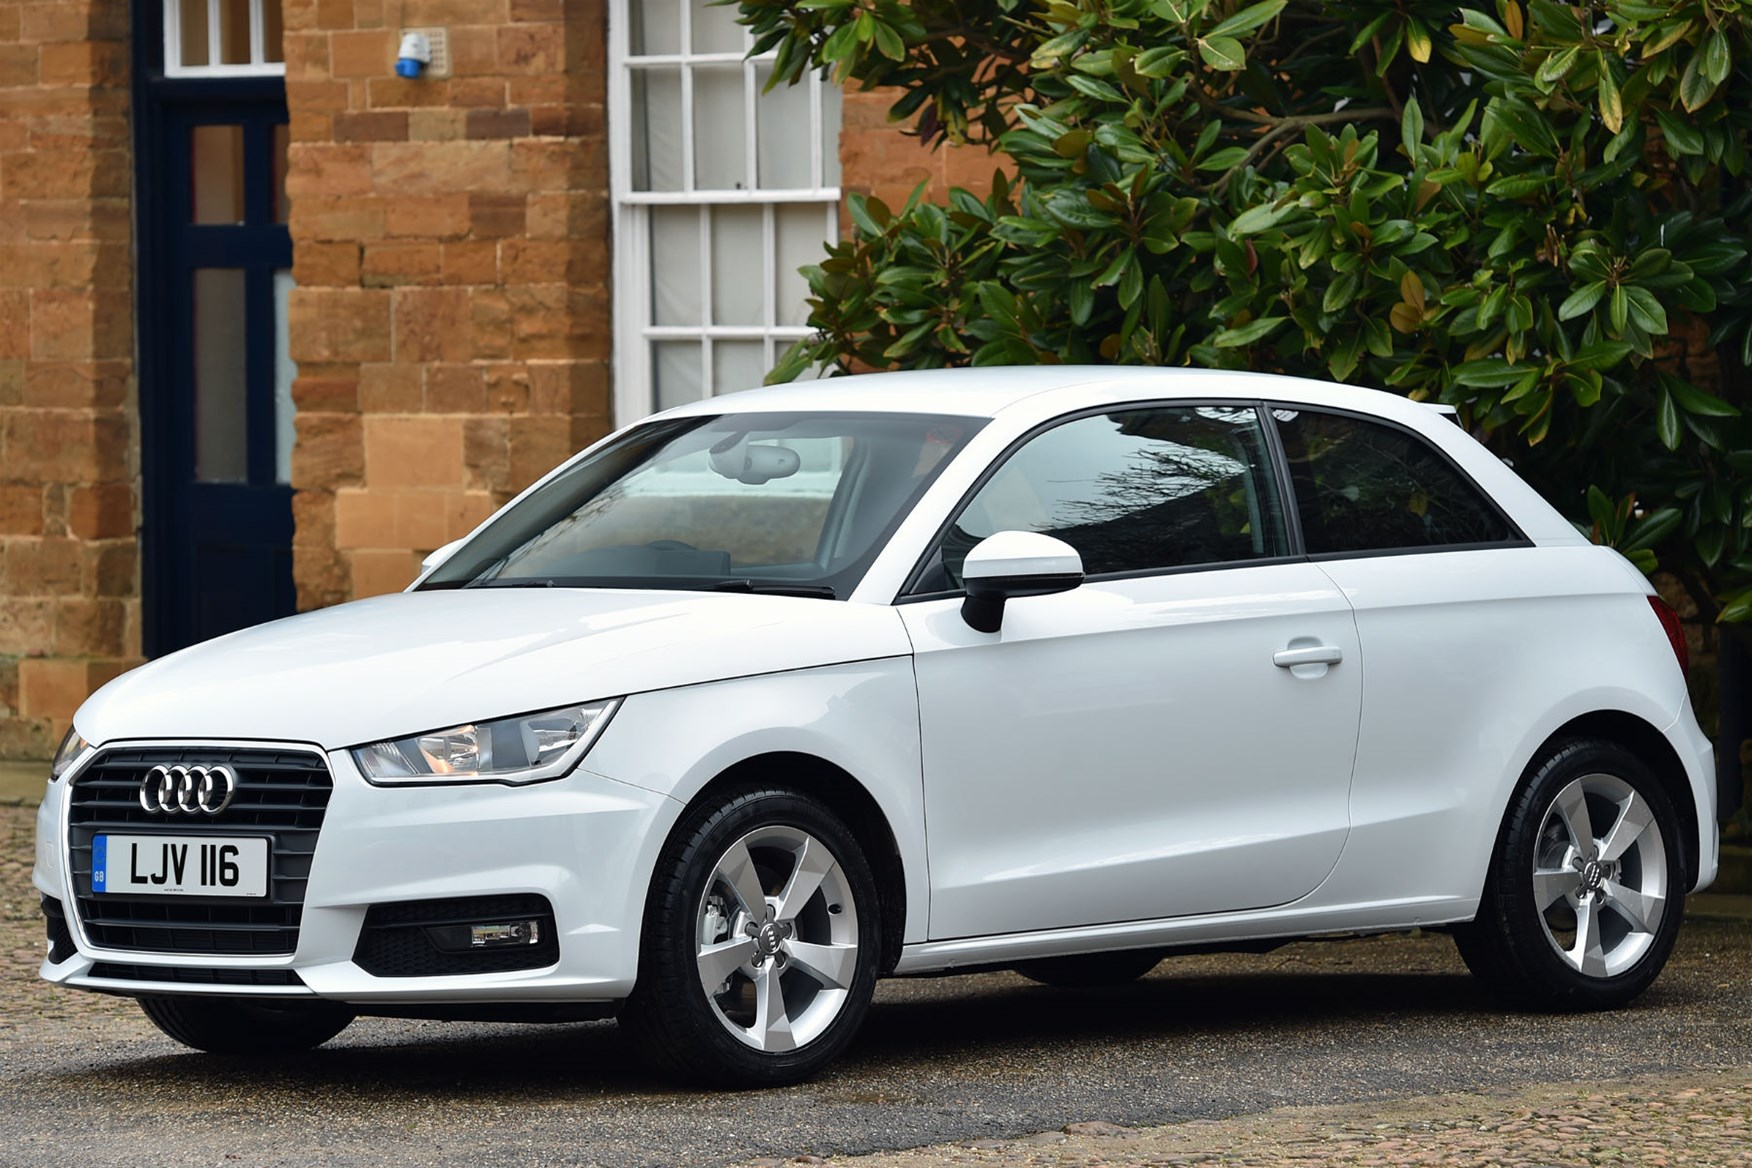 PCP Finance Best New Car Deals For Under Per Month Parkers - Audi car loan calculator